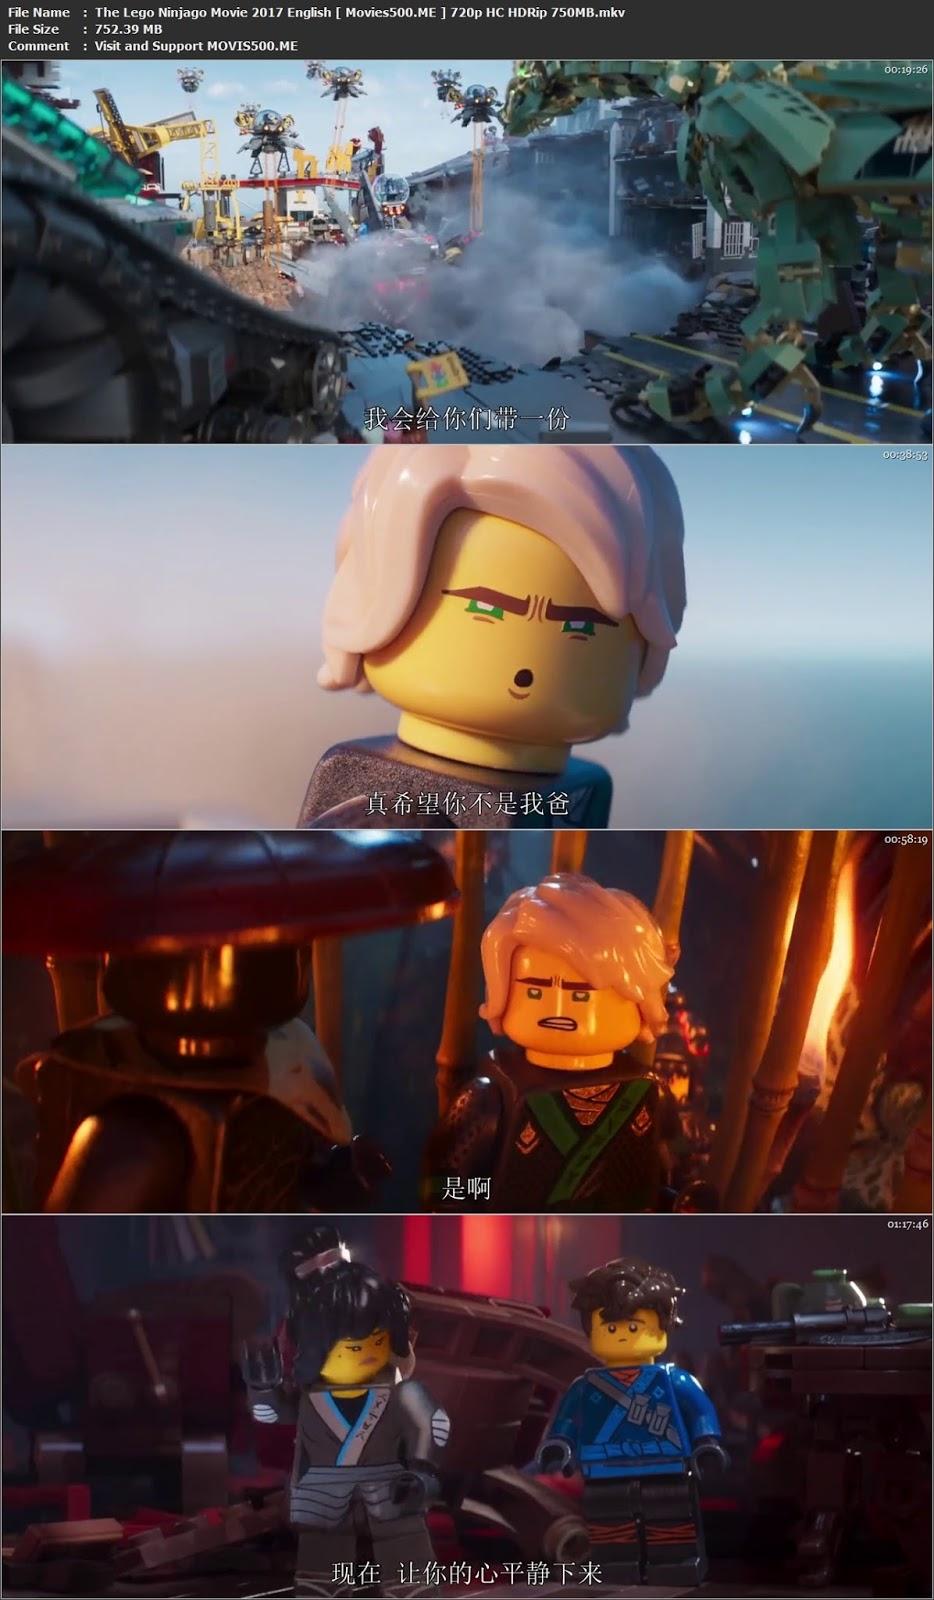 The Lego Ninjago Movie 2017 English 750MB HC HDRip 720p at movies500.site